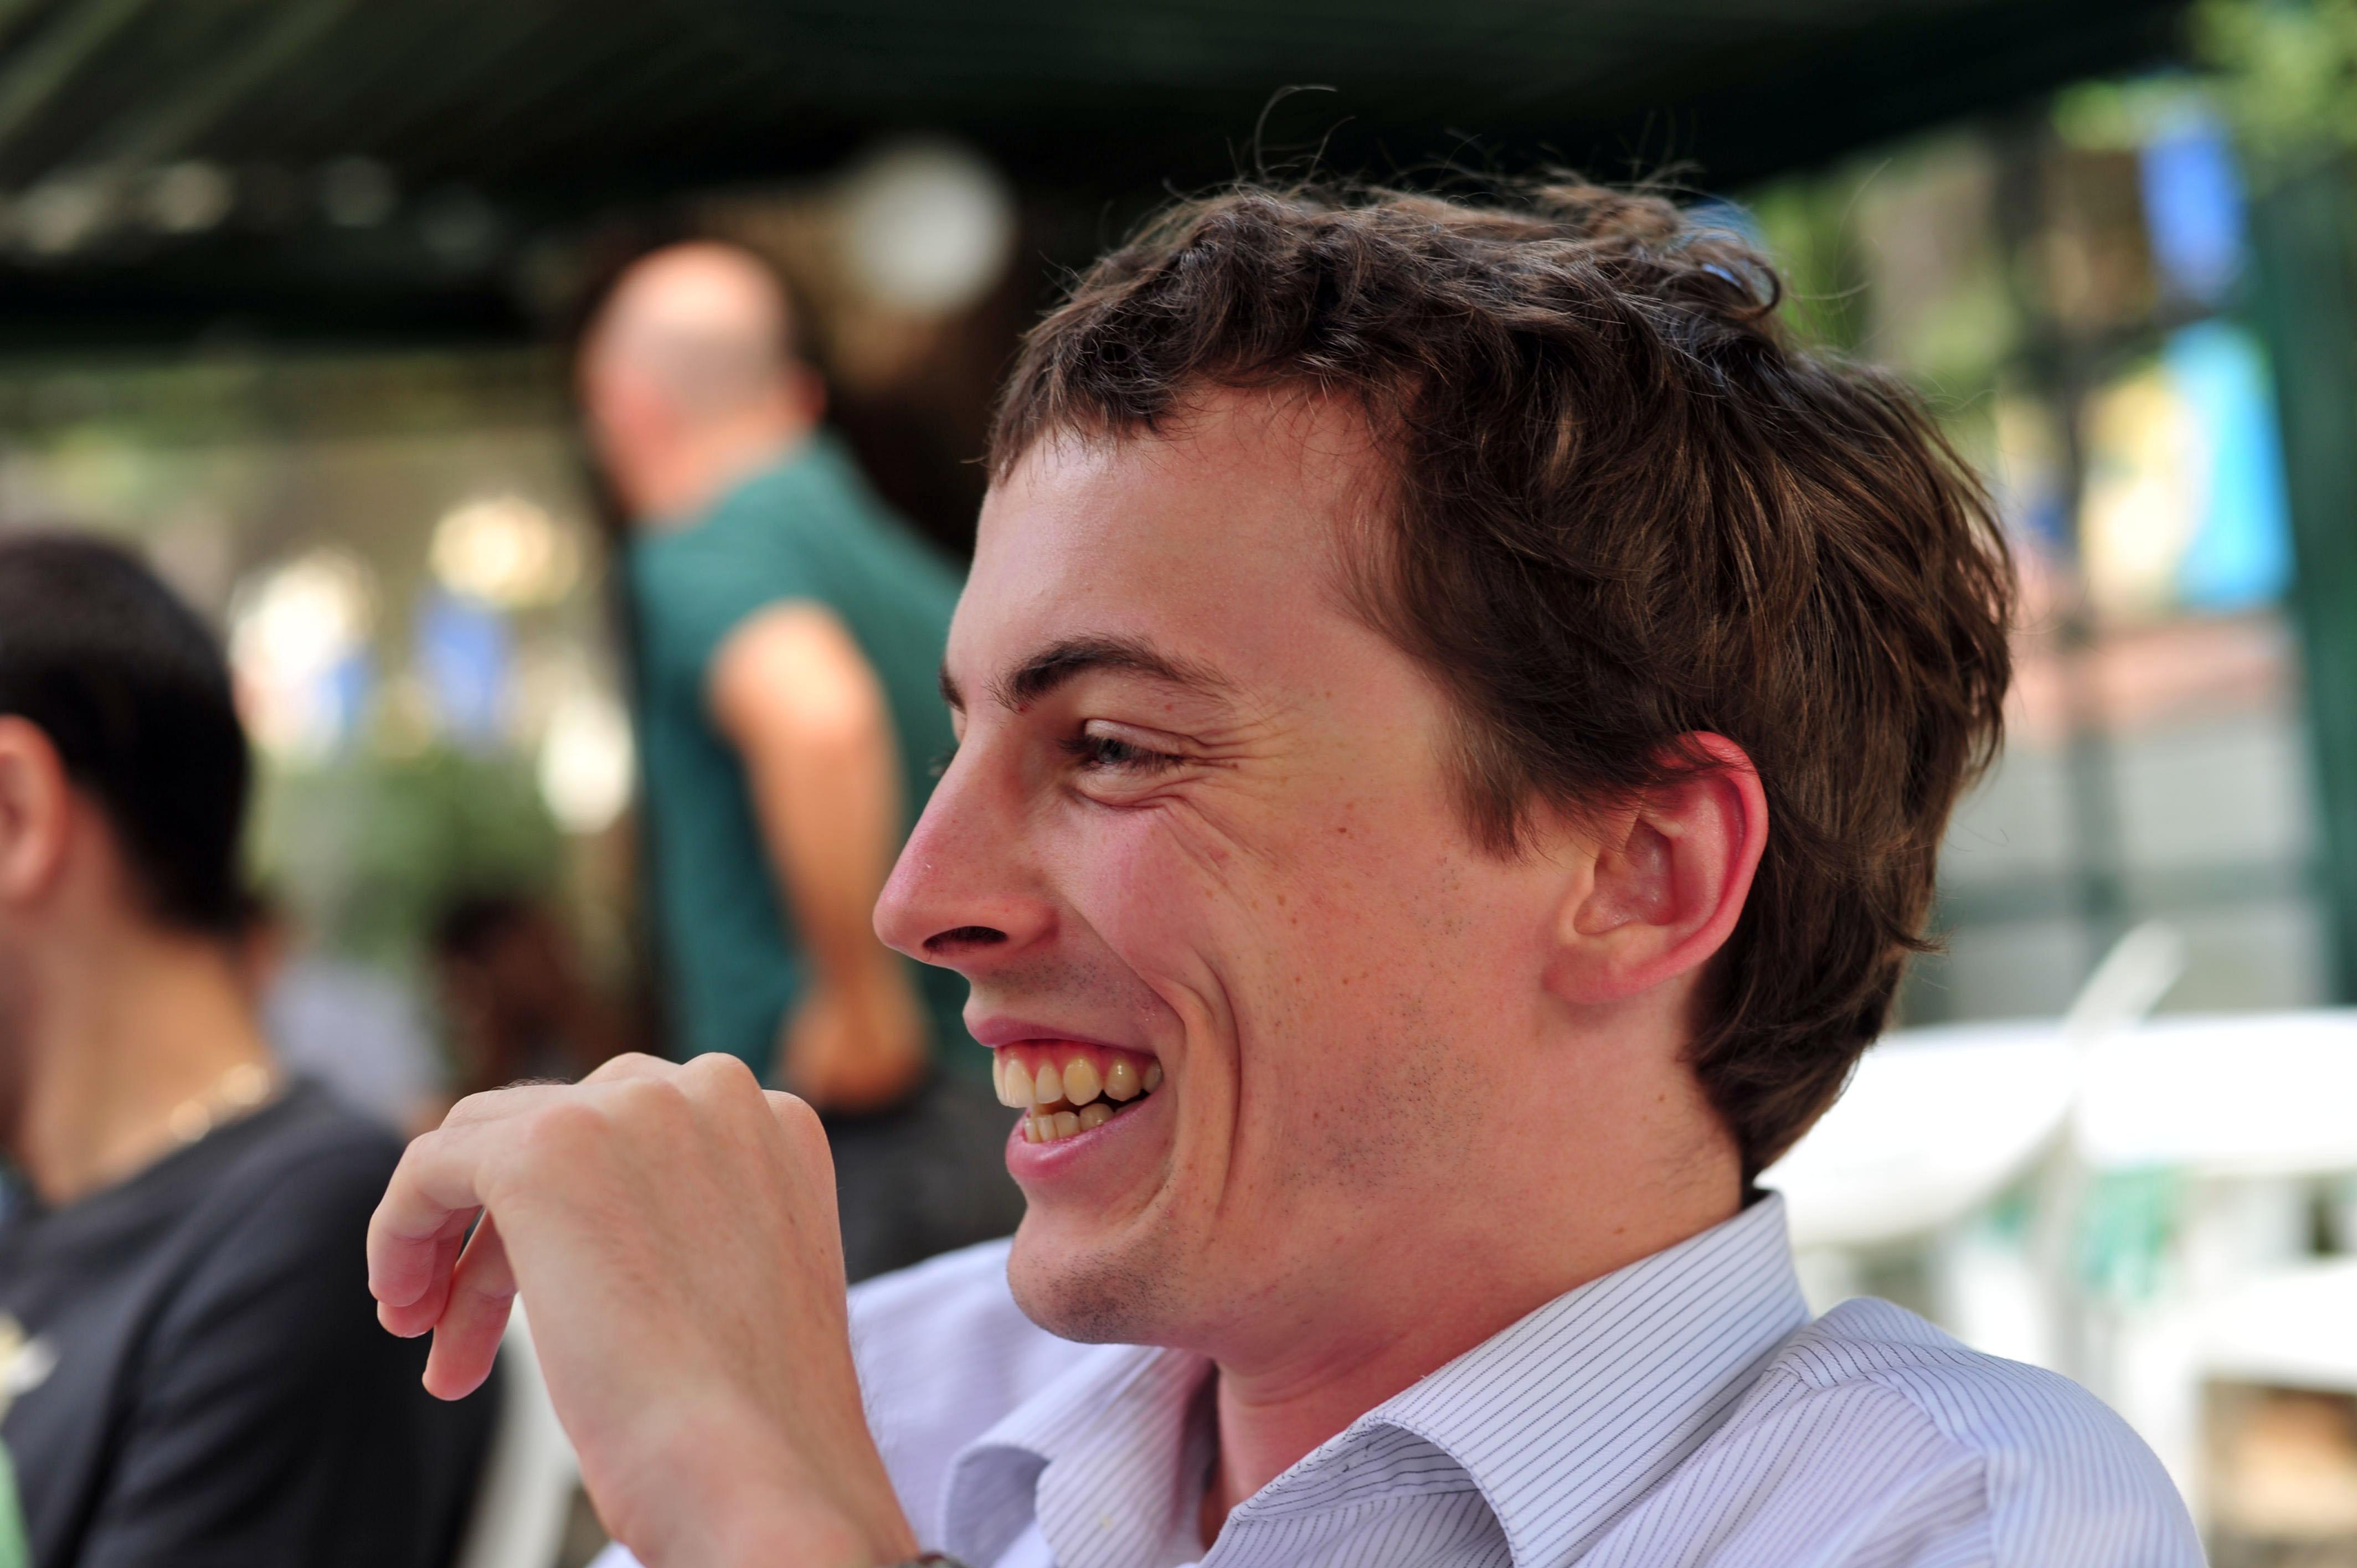 Andrew Spittle